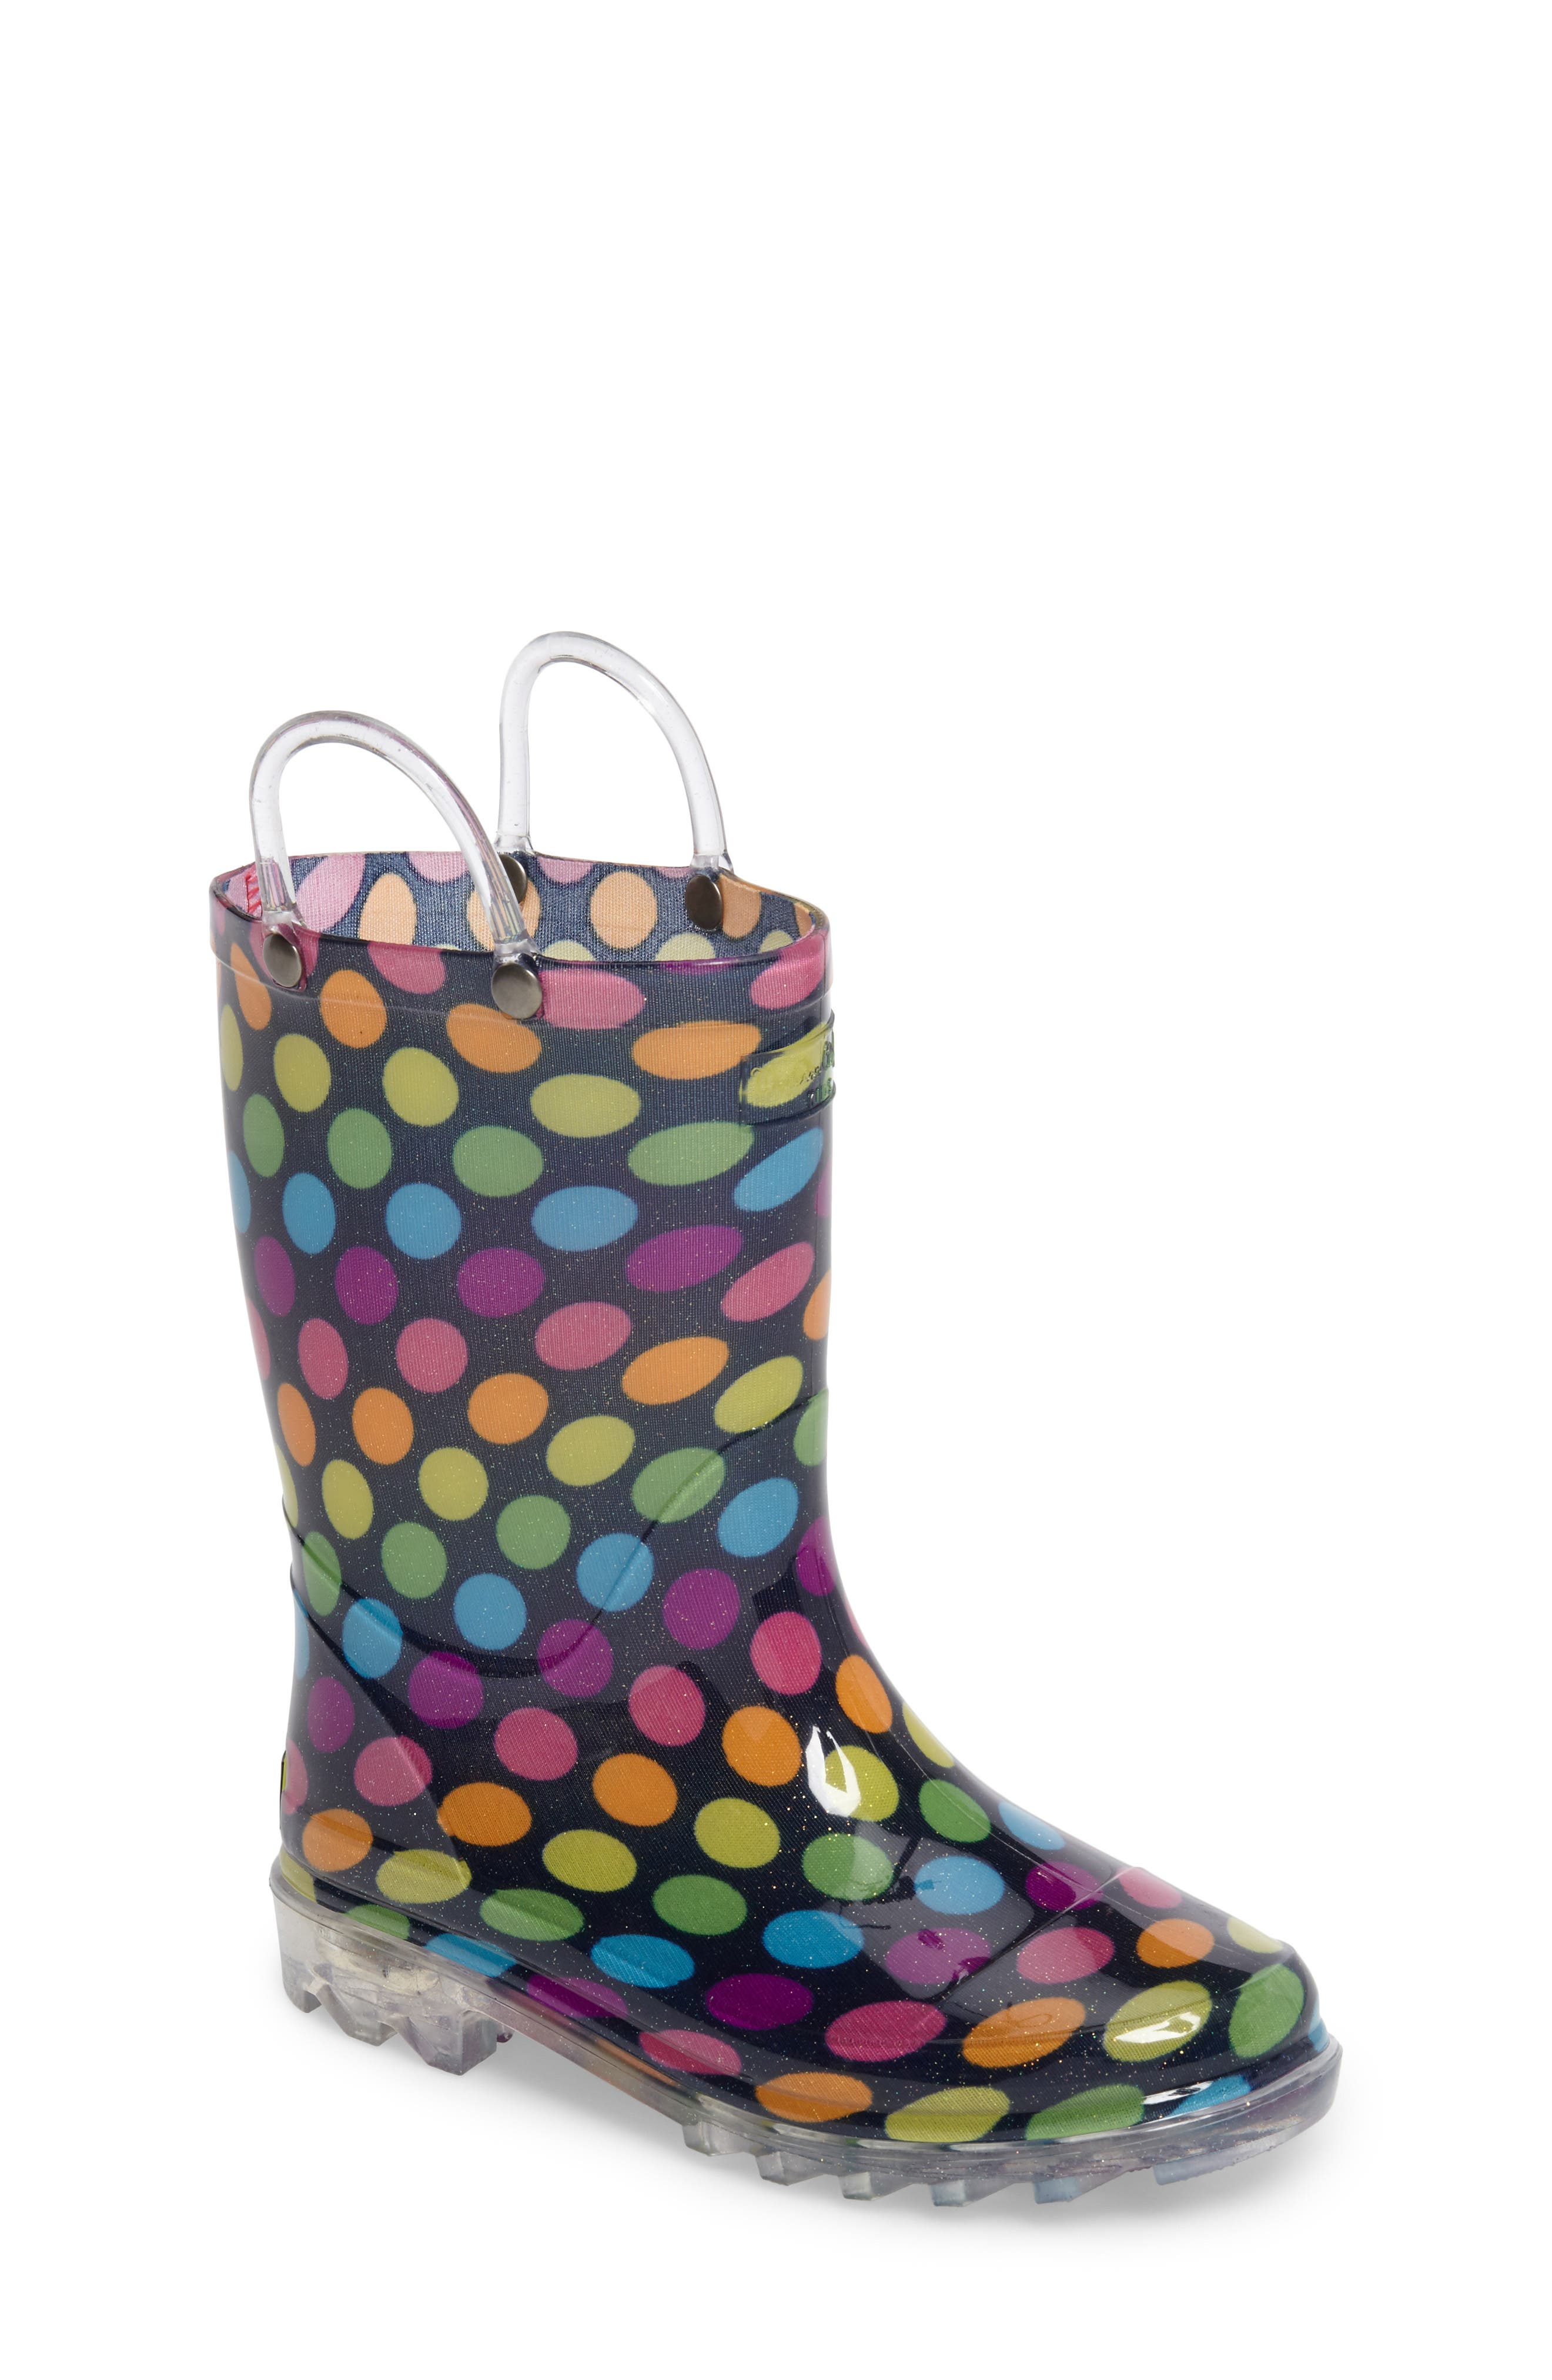 Western Chief Darling Dot Light-Up Rain Boot (Toddler & Little Kid)